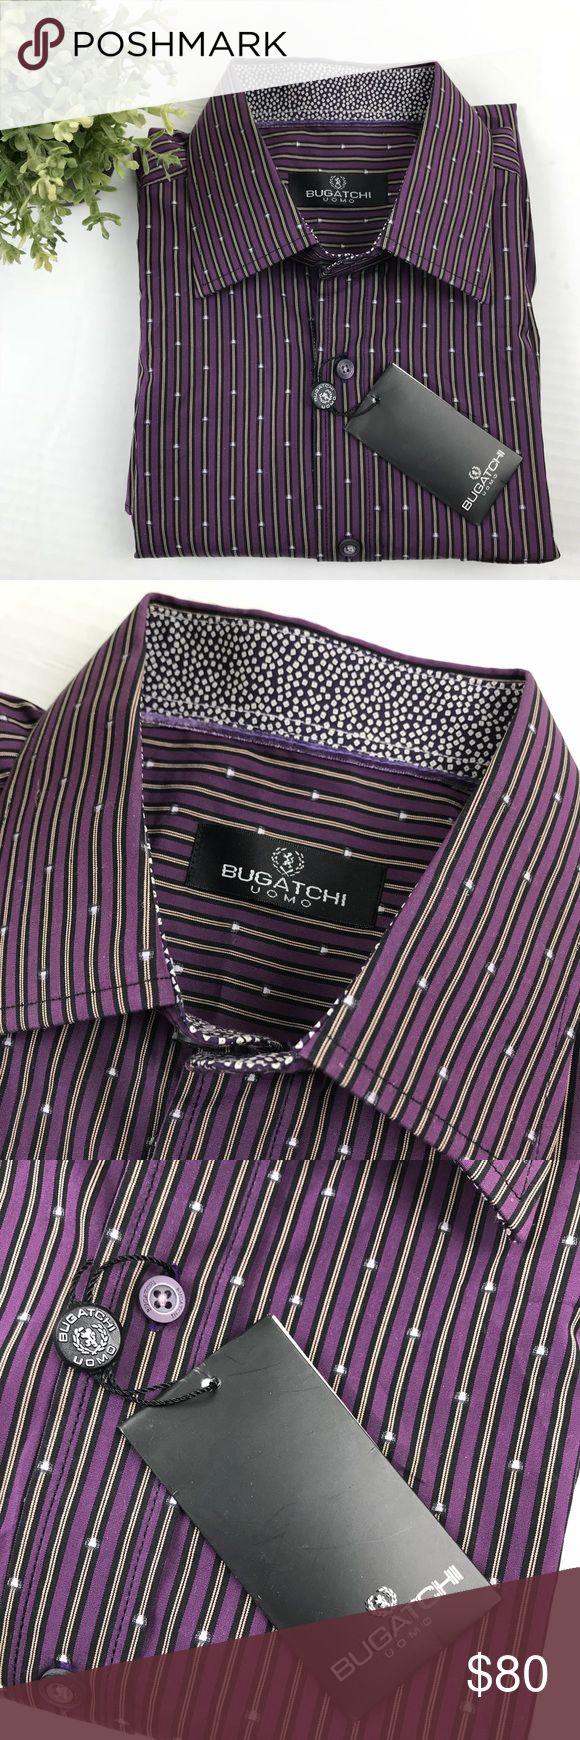 "Bugatchi Uomo purple button down shirt Large NWT!  Measurements: Shoulder to shoulder: 20"" Armpit to armpit: 25.5 Armpit to hem: 17"" Sleeve length:26"" Armhold:11"" Bugatchi Shirts Dress Shirts"